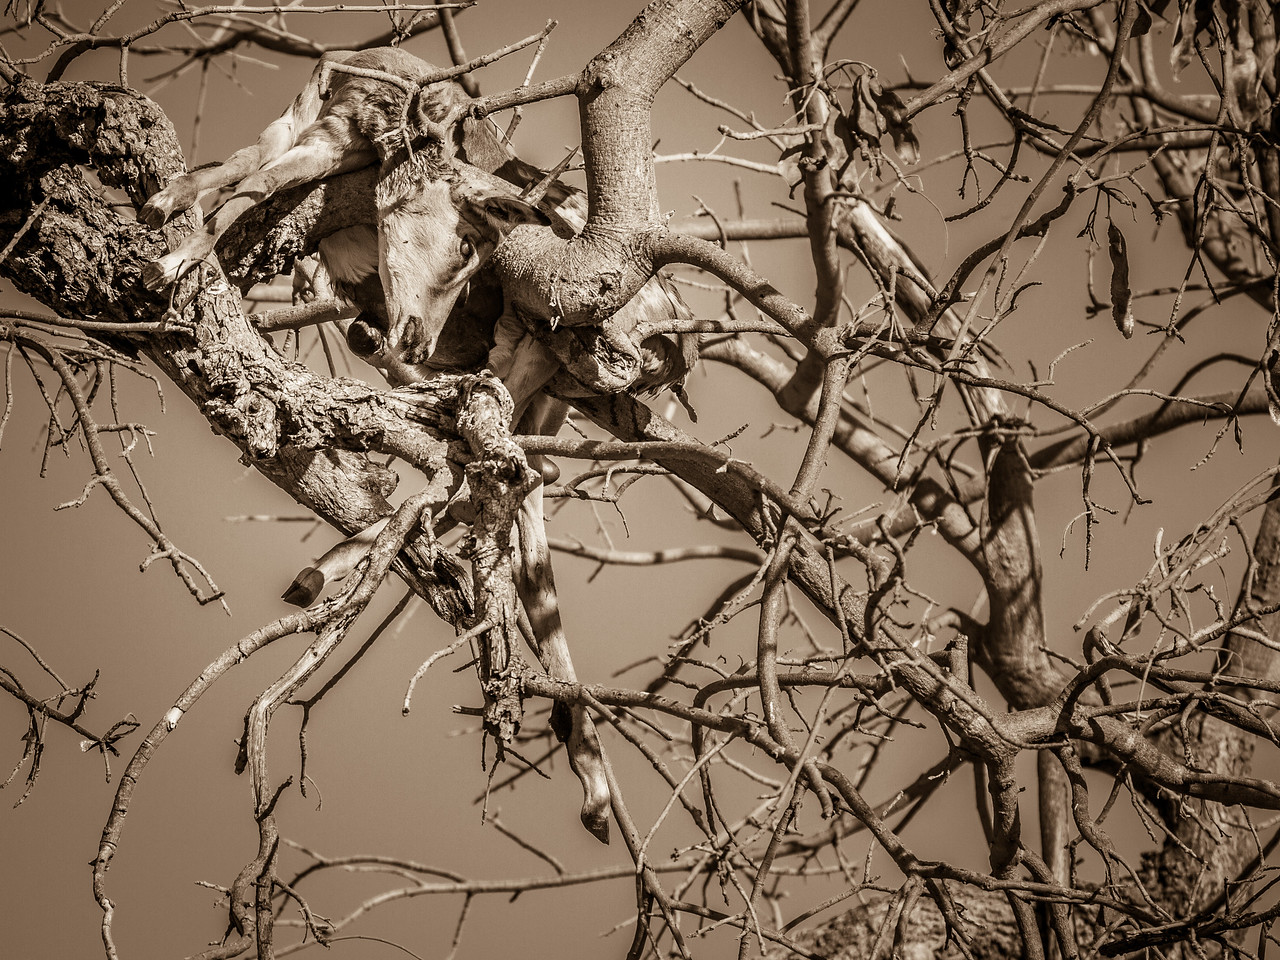 Tragic wildlife scene at Chobe NP.